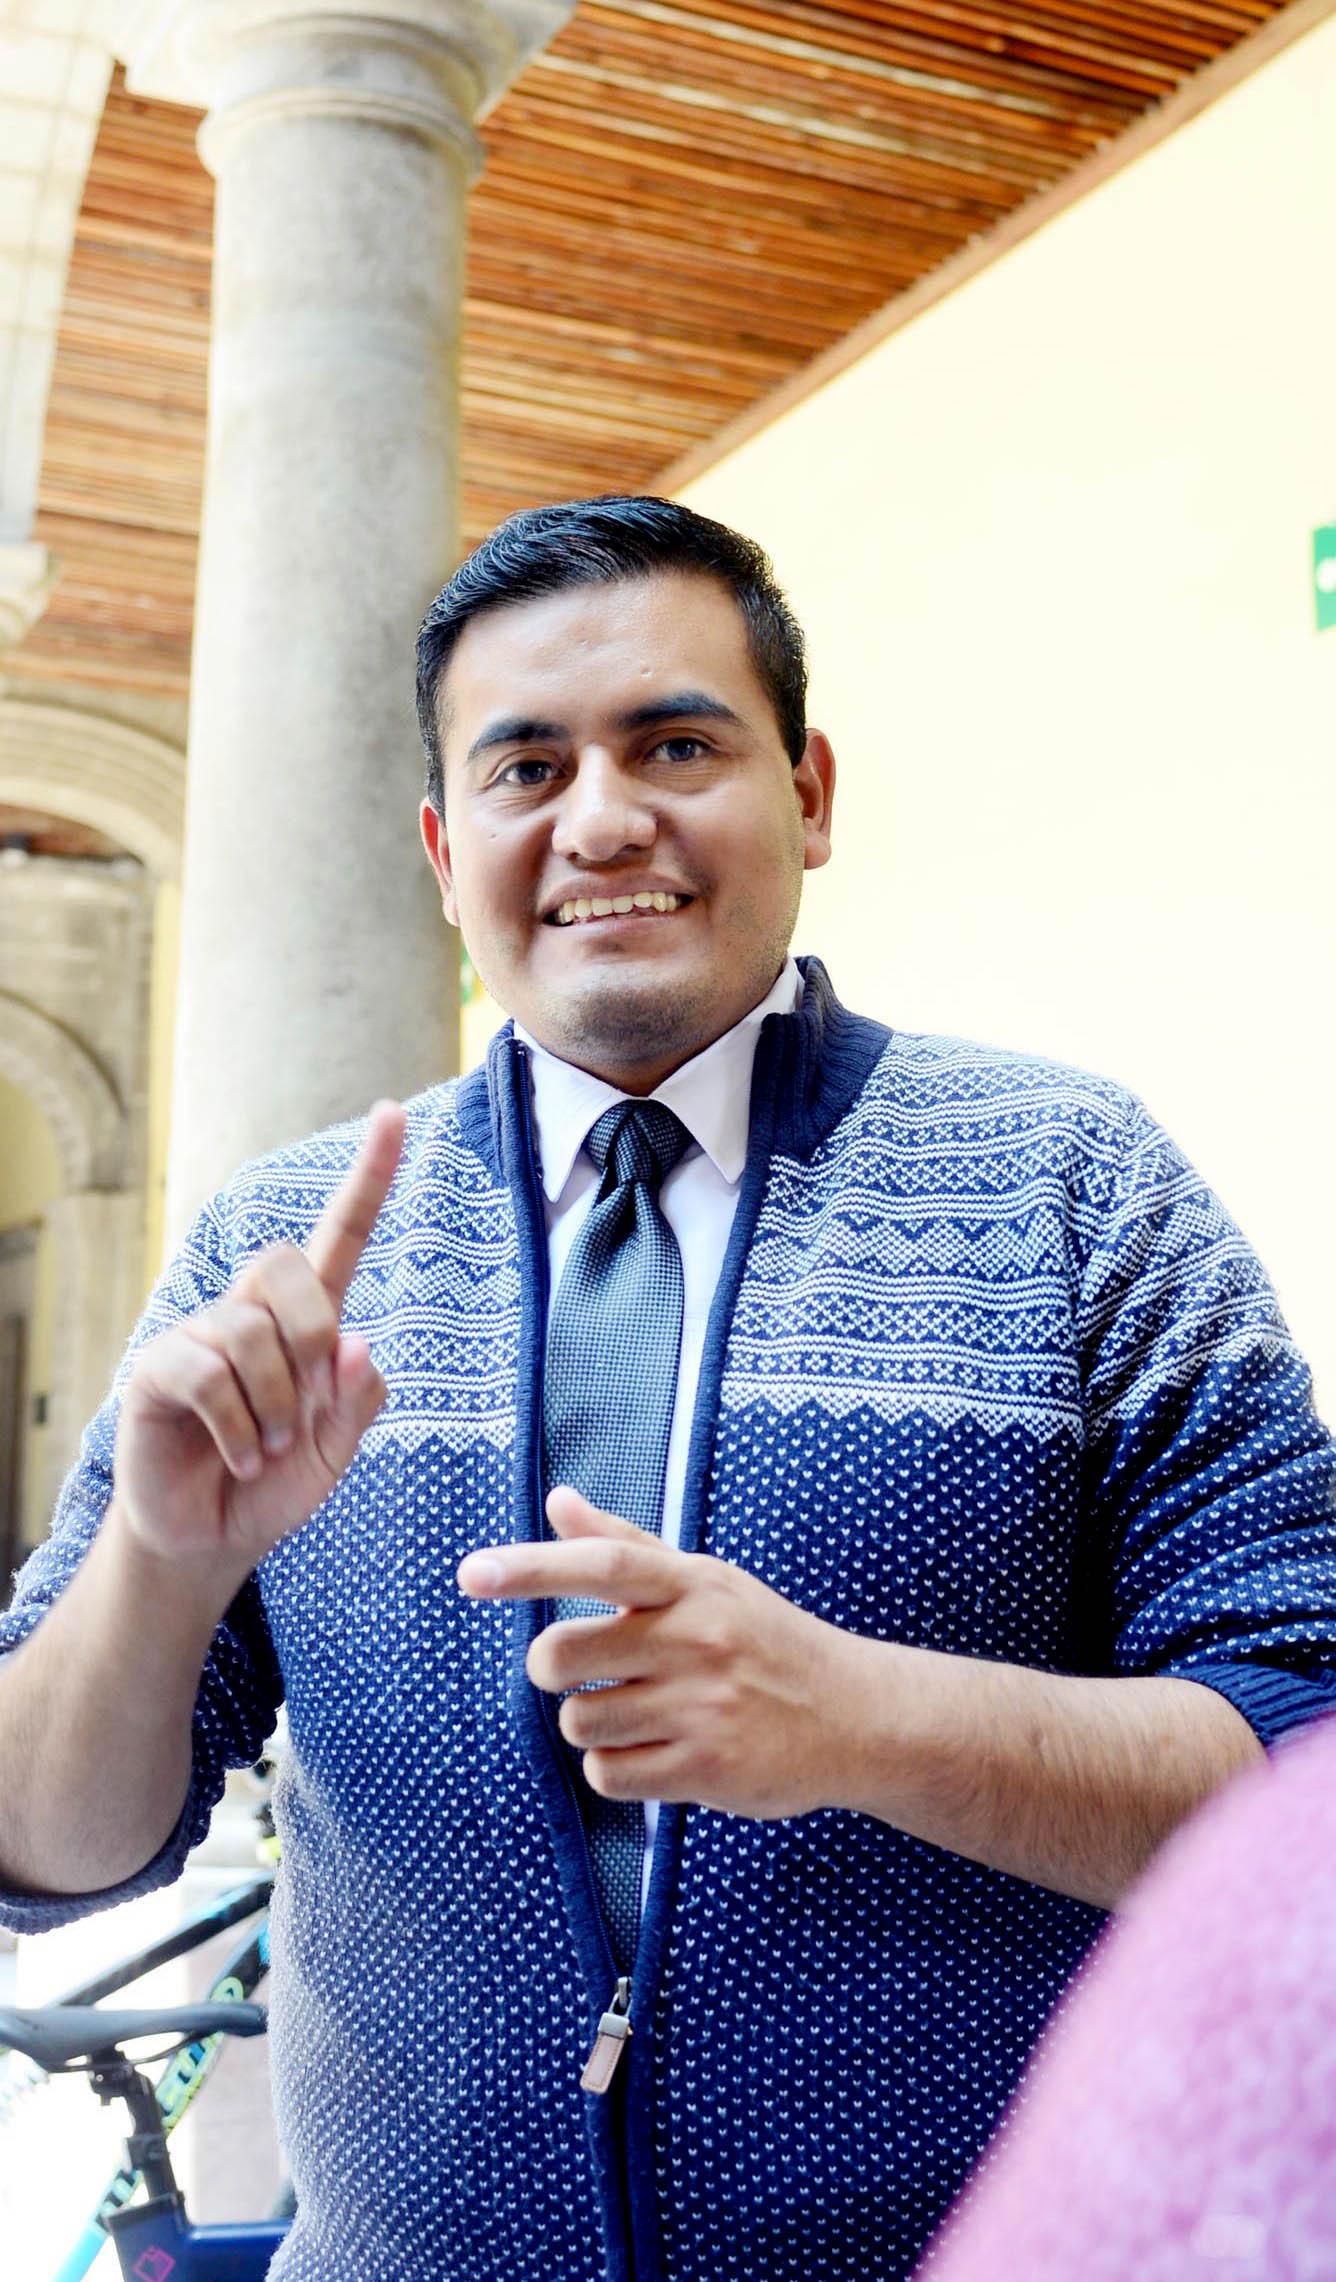 Gana Universitario Premio por su Labor Altruista